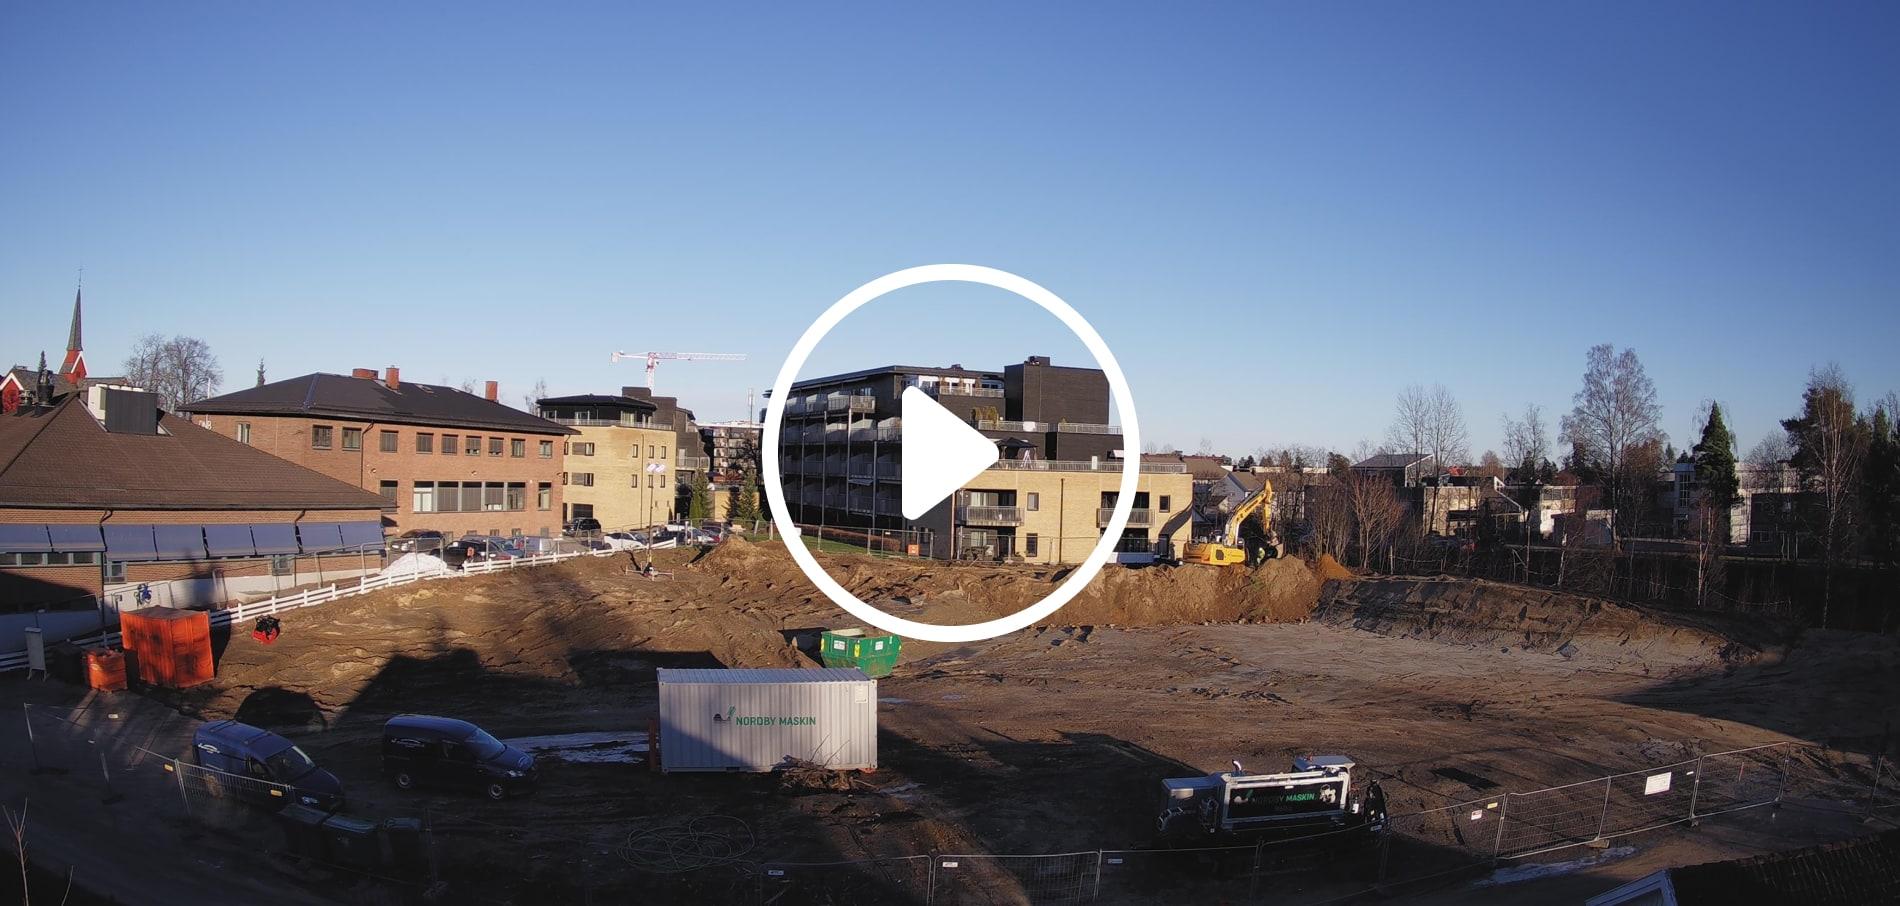 Byggeplasskampera Hagehuset